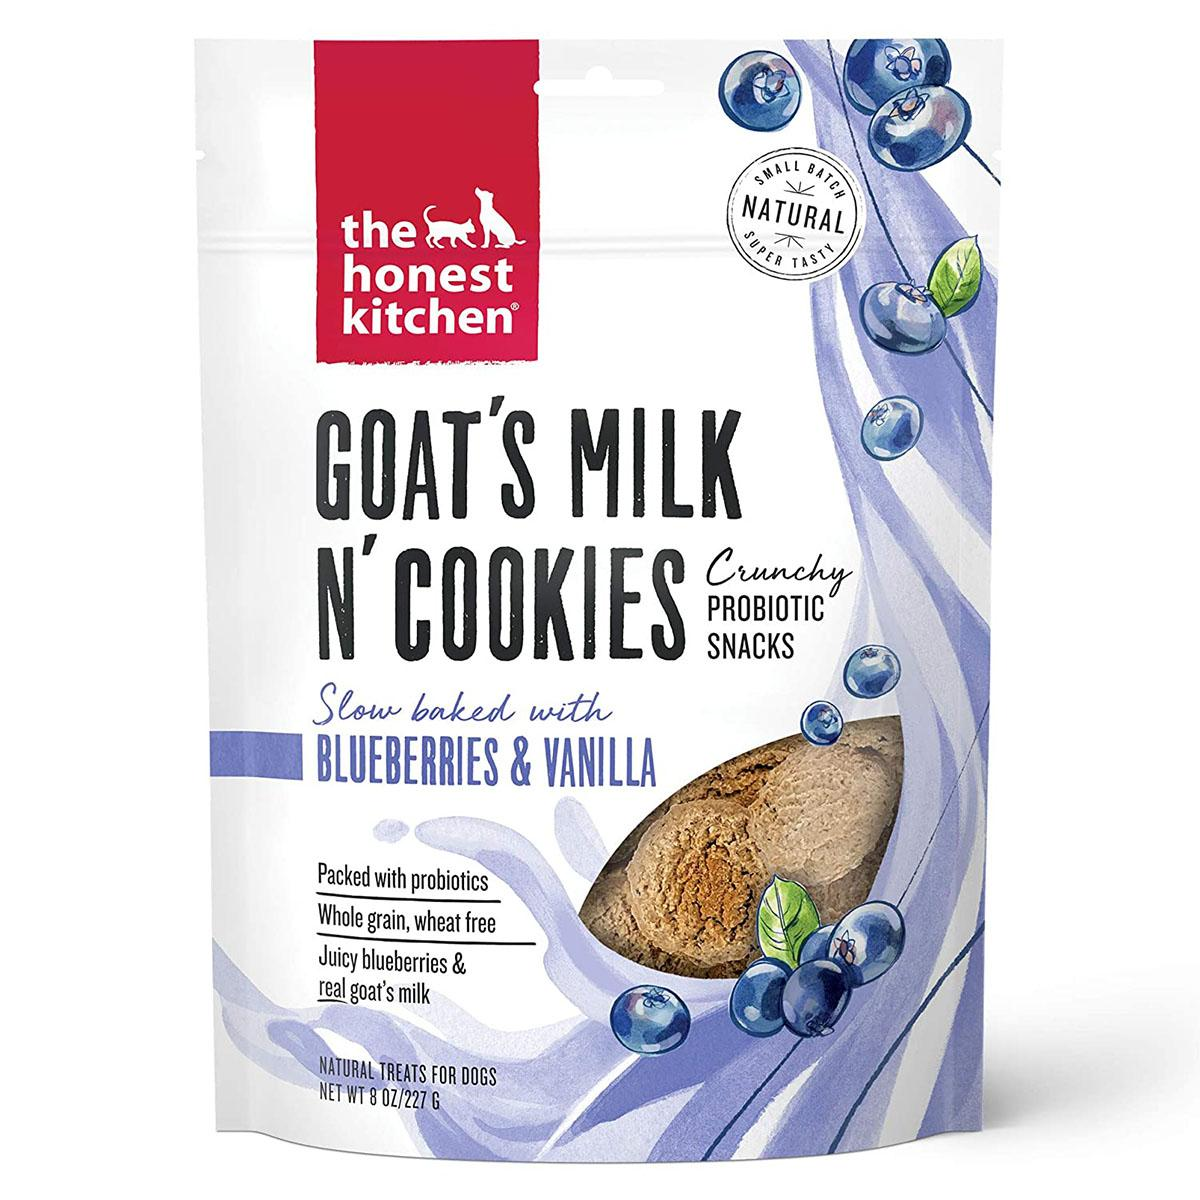 The Honest Kitchen Goat's Milk N' Cookies Dog Treats - Blueberries & Vanilla Recipe